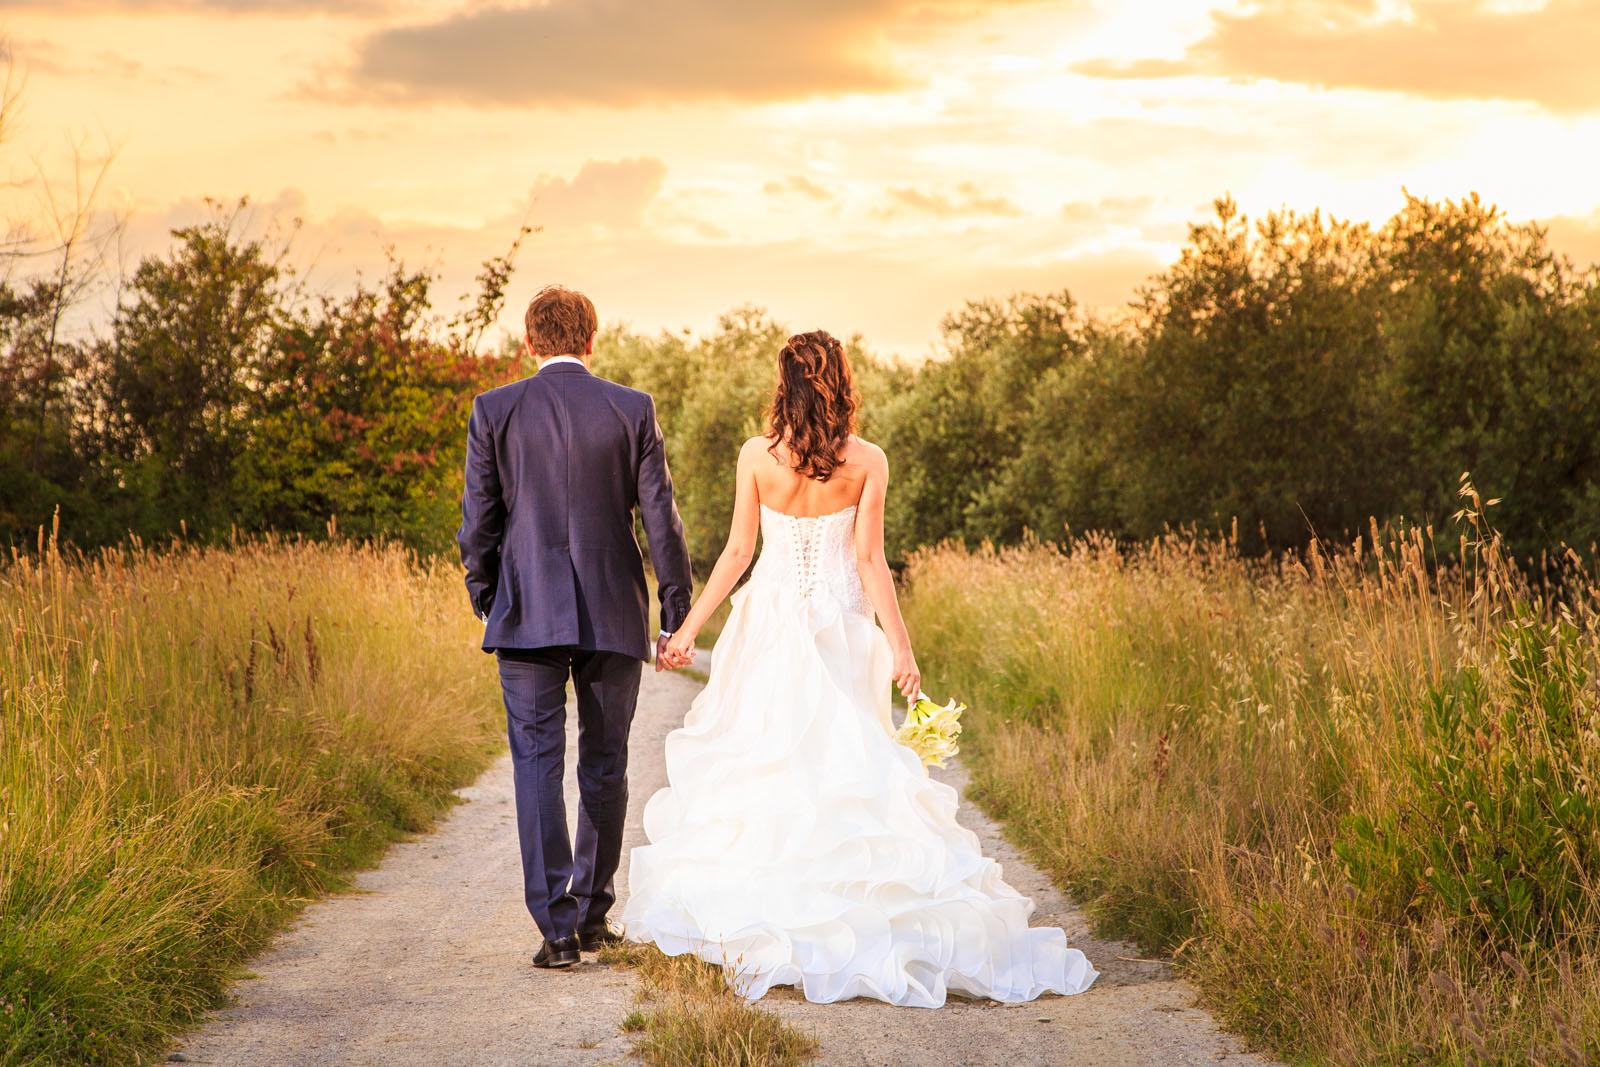 matrimonio langhe e roero guida